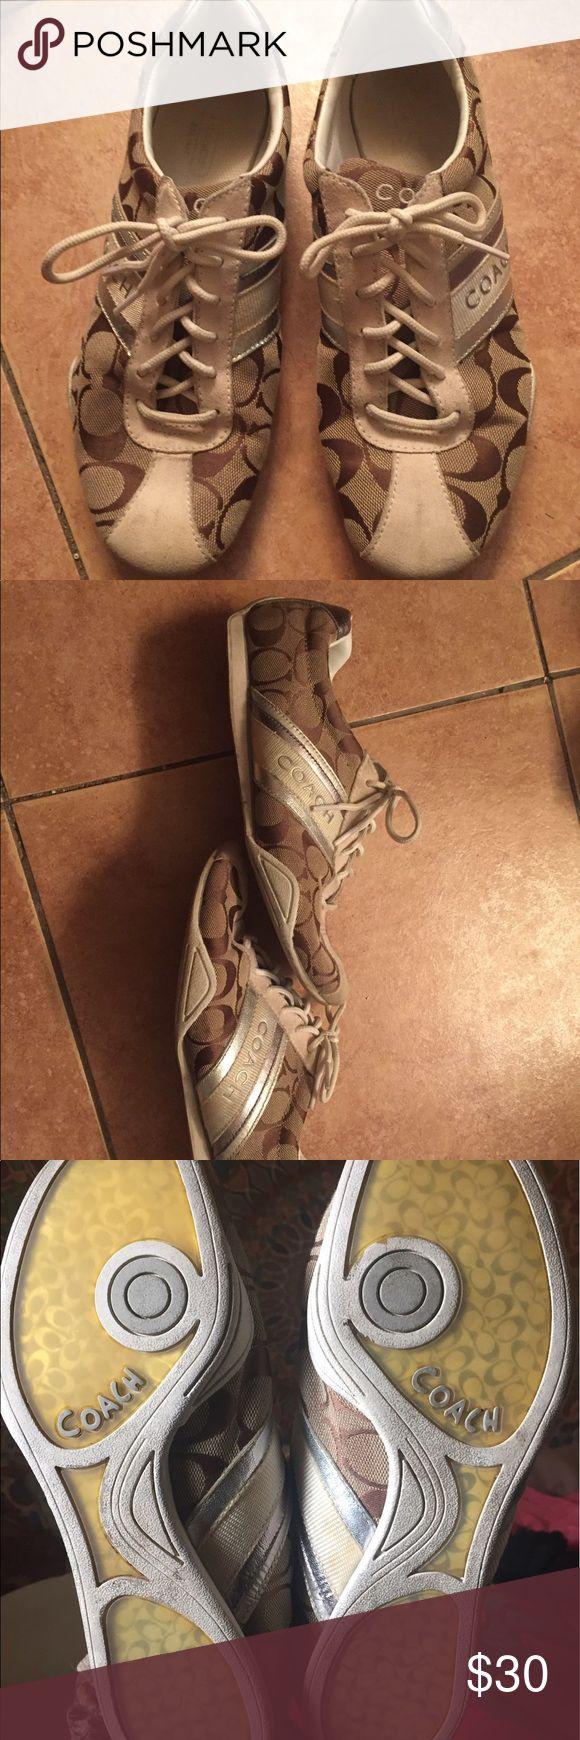 Authentic Coach tennis shoes Authentic brown Coach tennis shoes. Normal wear. Coach Shoes Sneakers